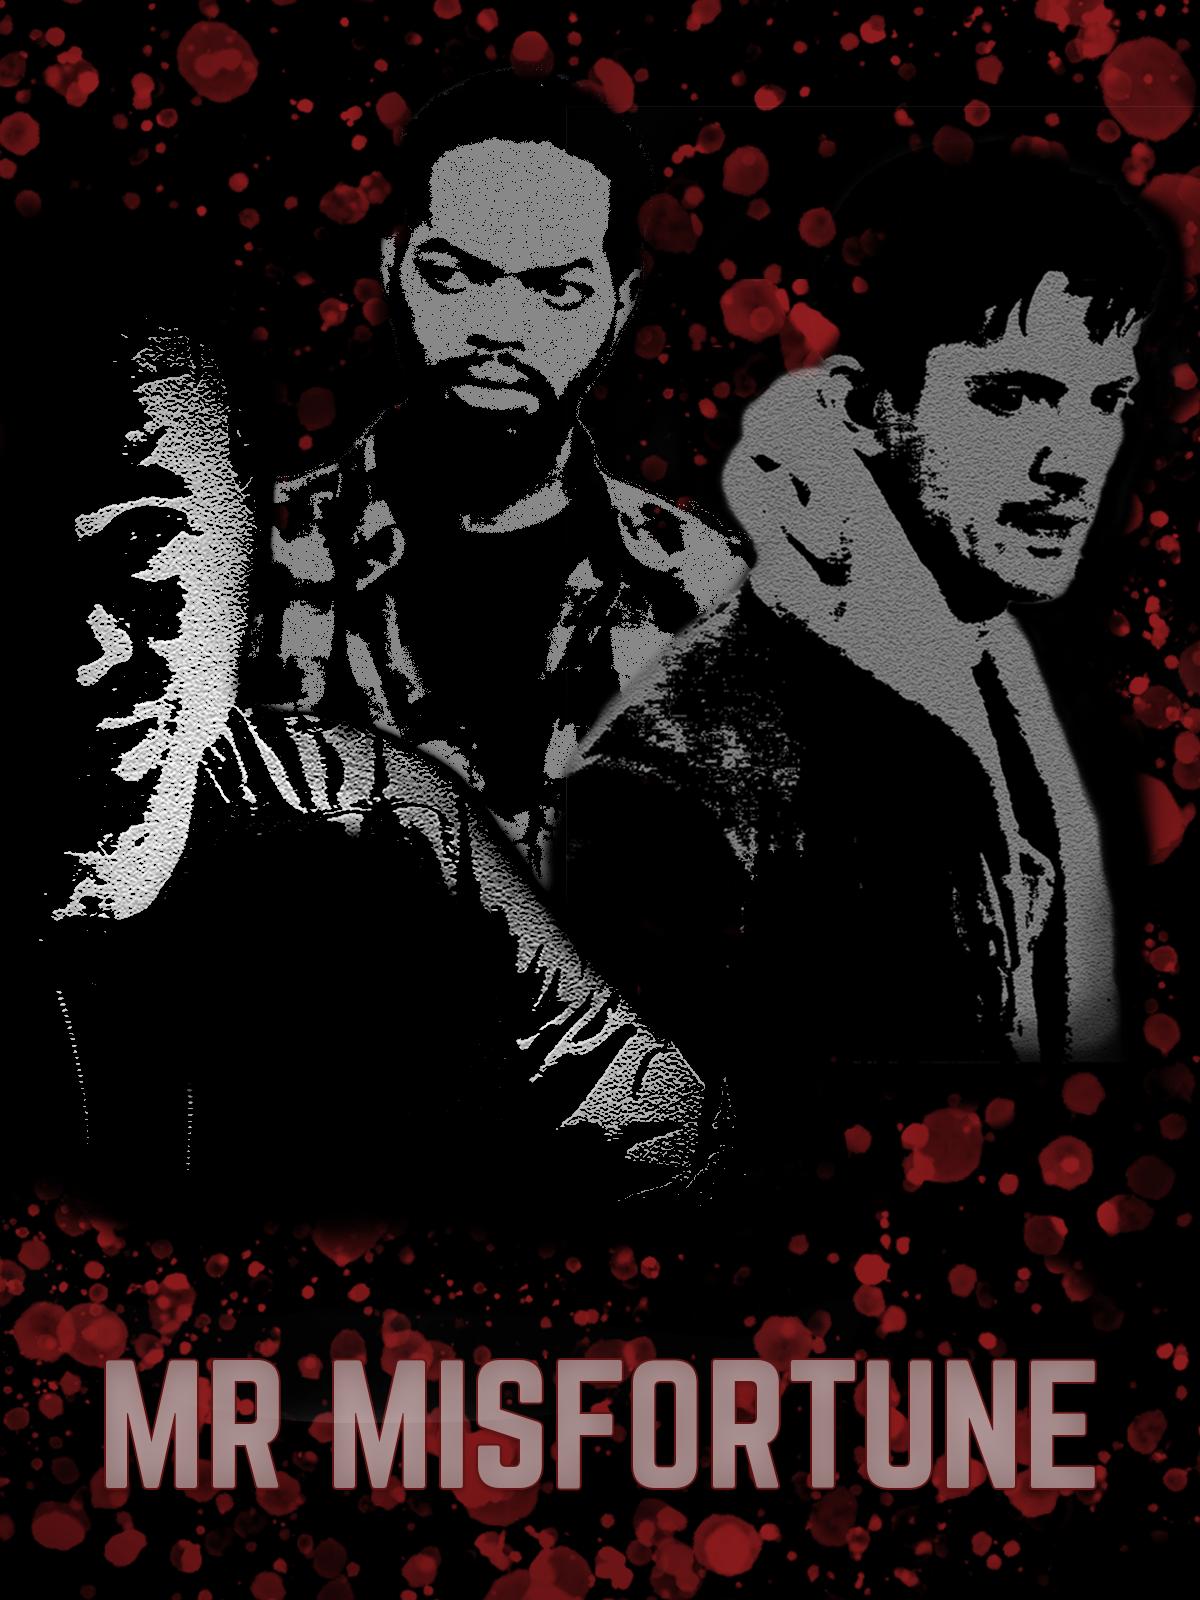 Mr Misfortune thumbnail